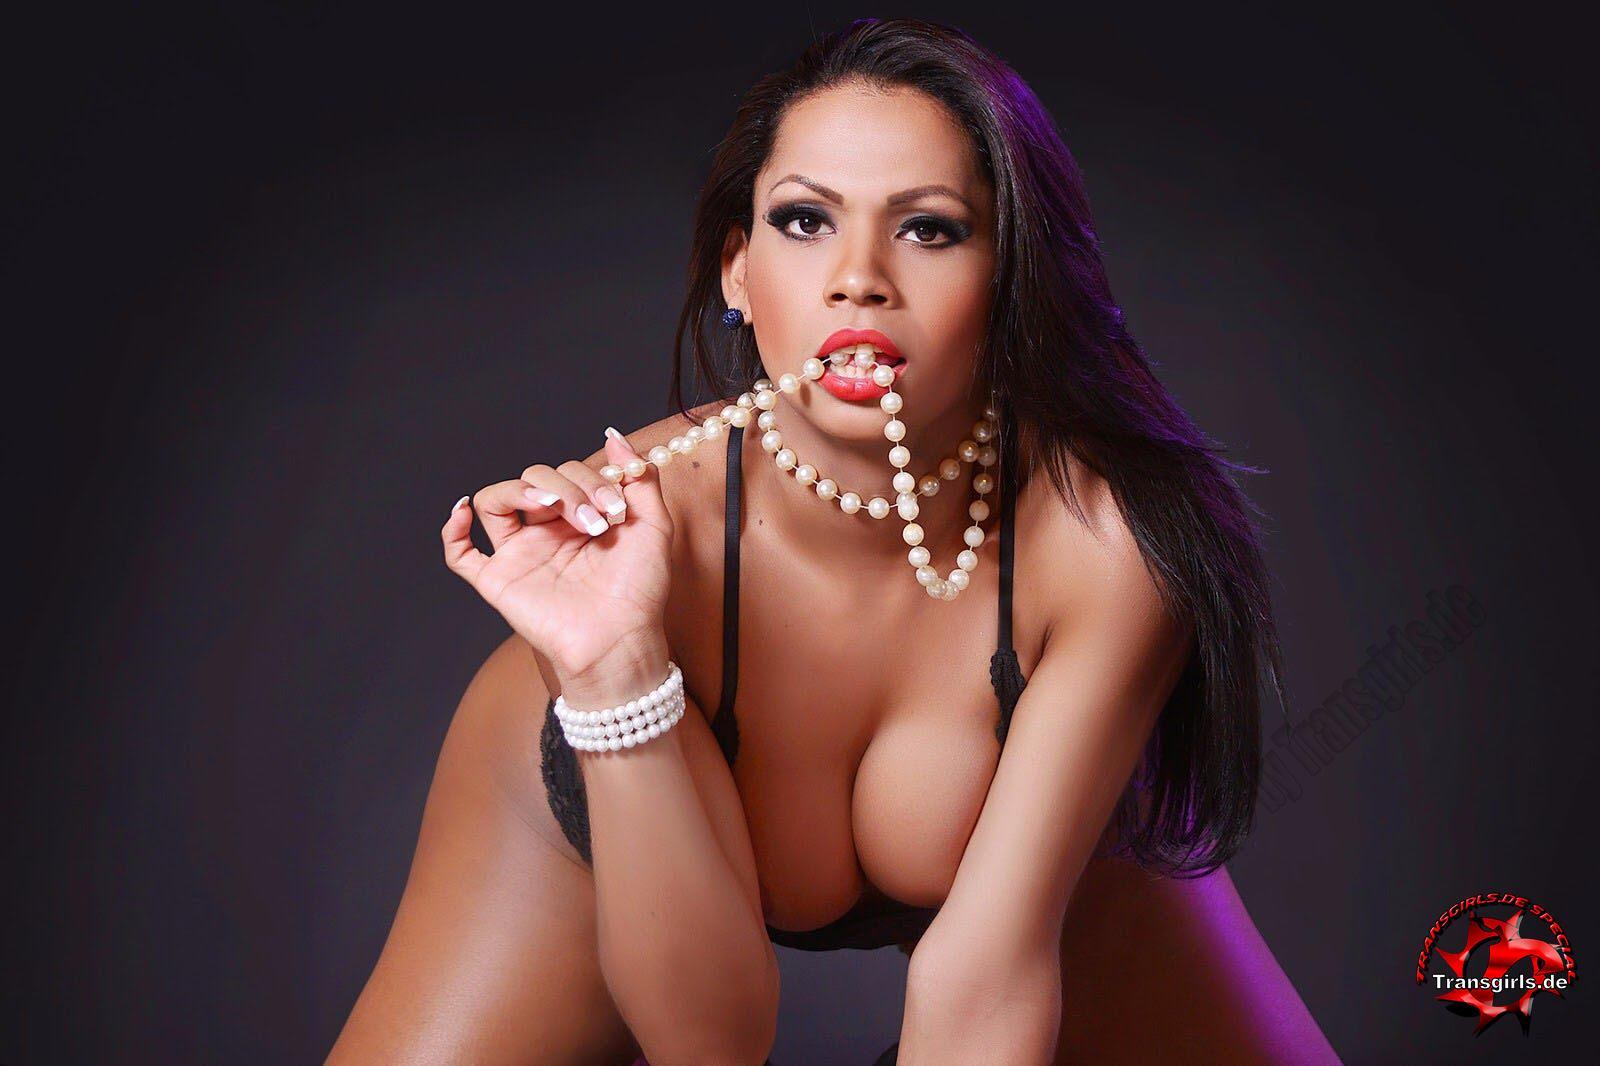 Foto Nr. 101546 von Shemale Trans Vanessa XXL